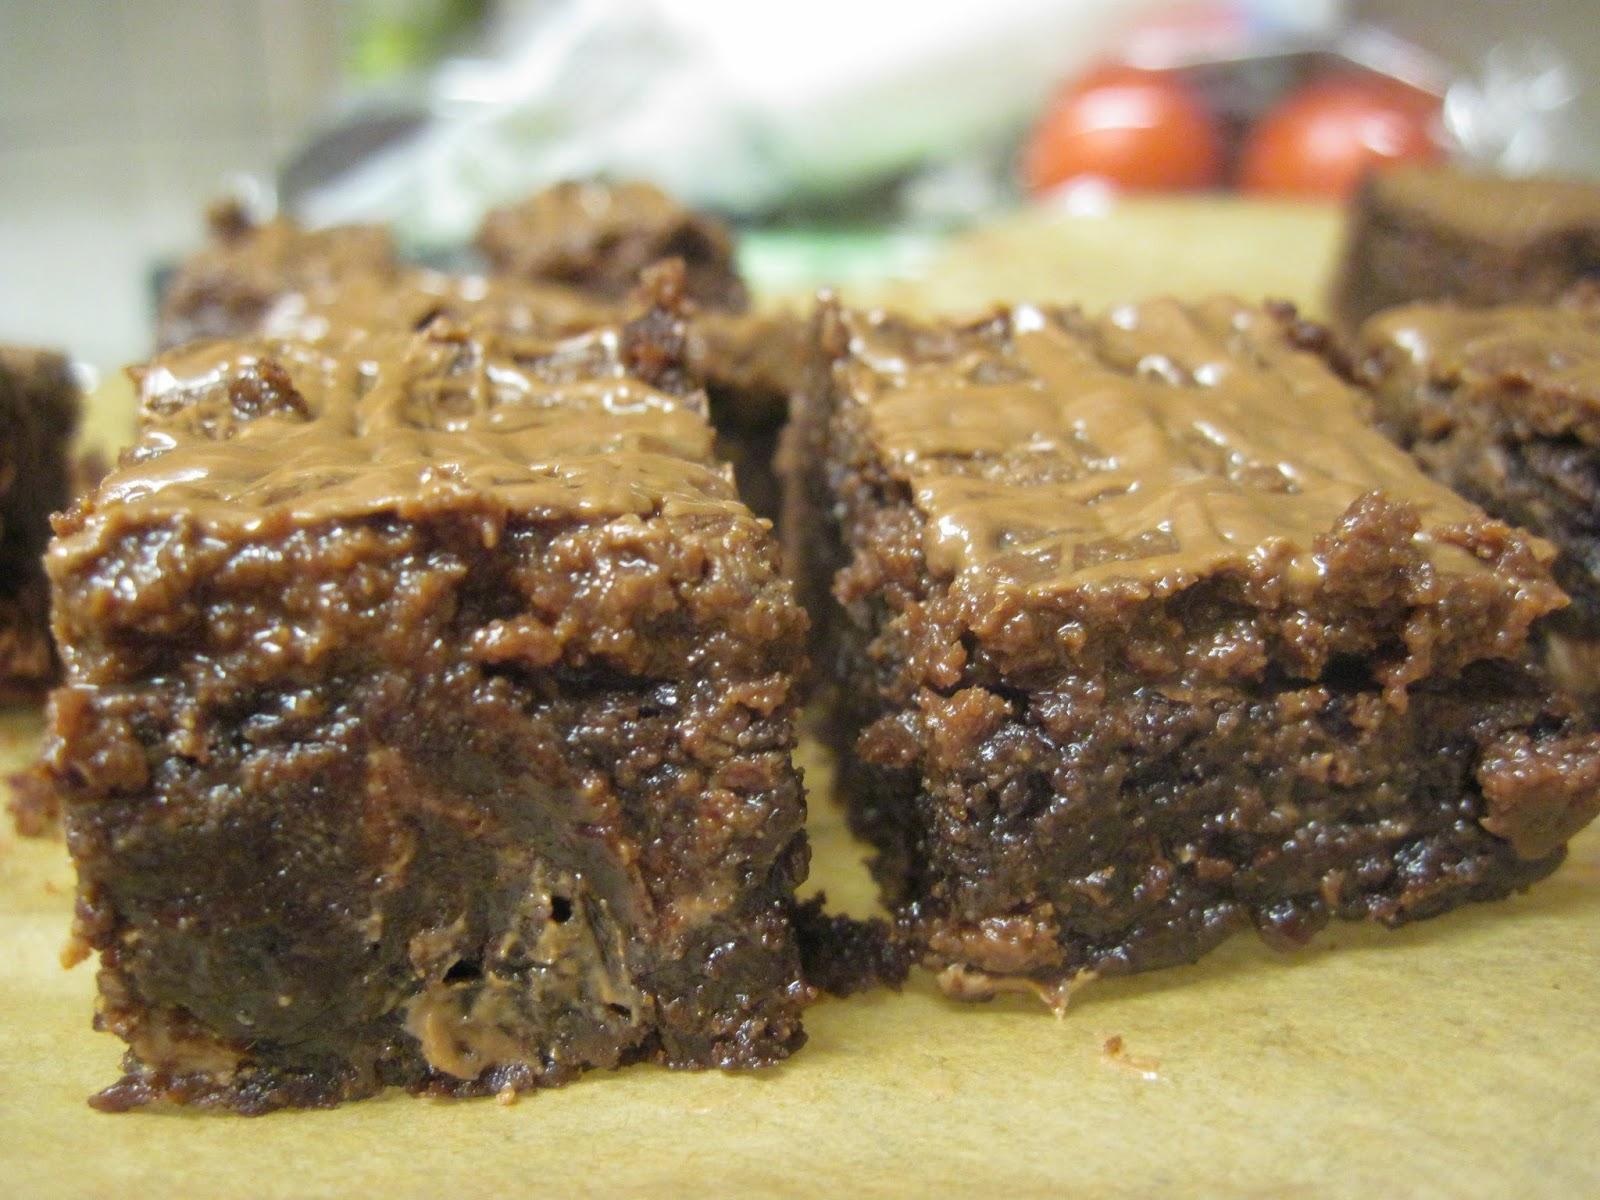 The Sugar Lump: Peanut butter truffle brownies